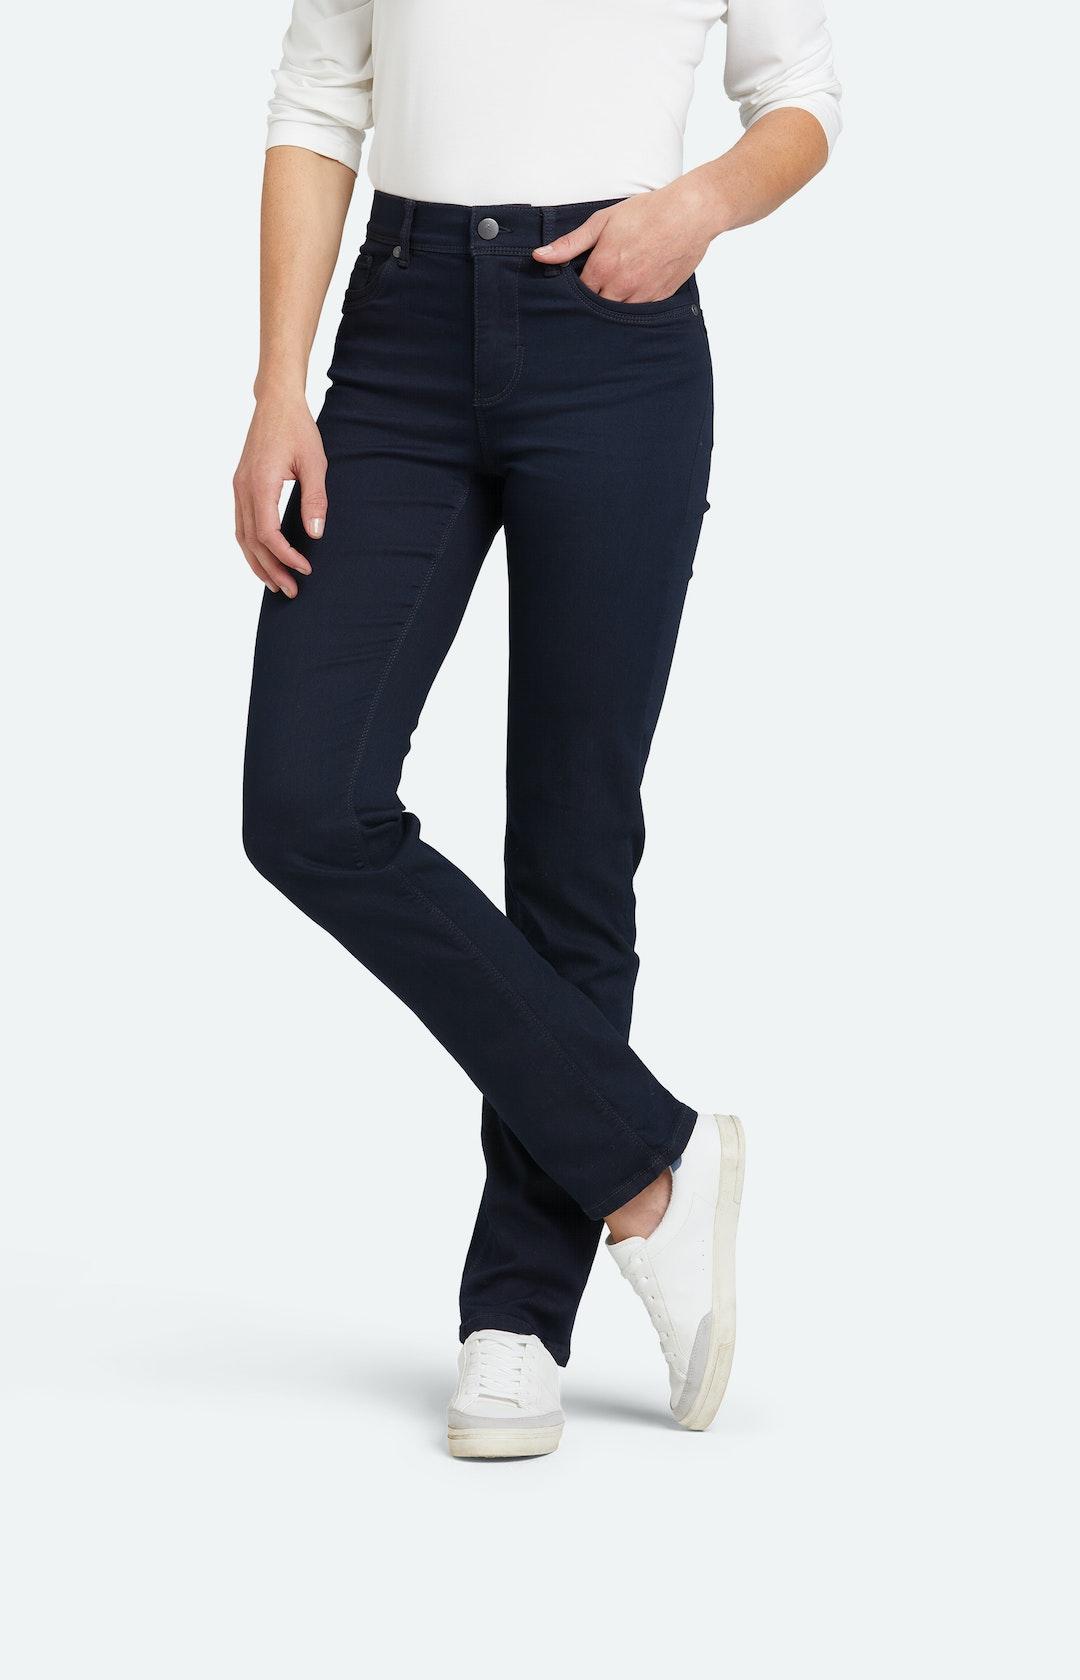 Jeans Doro 30inch